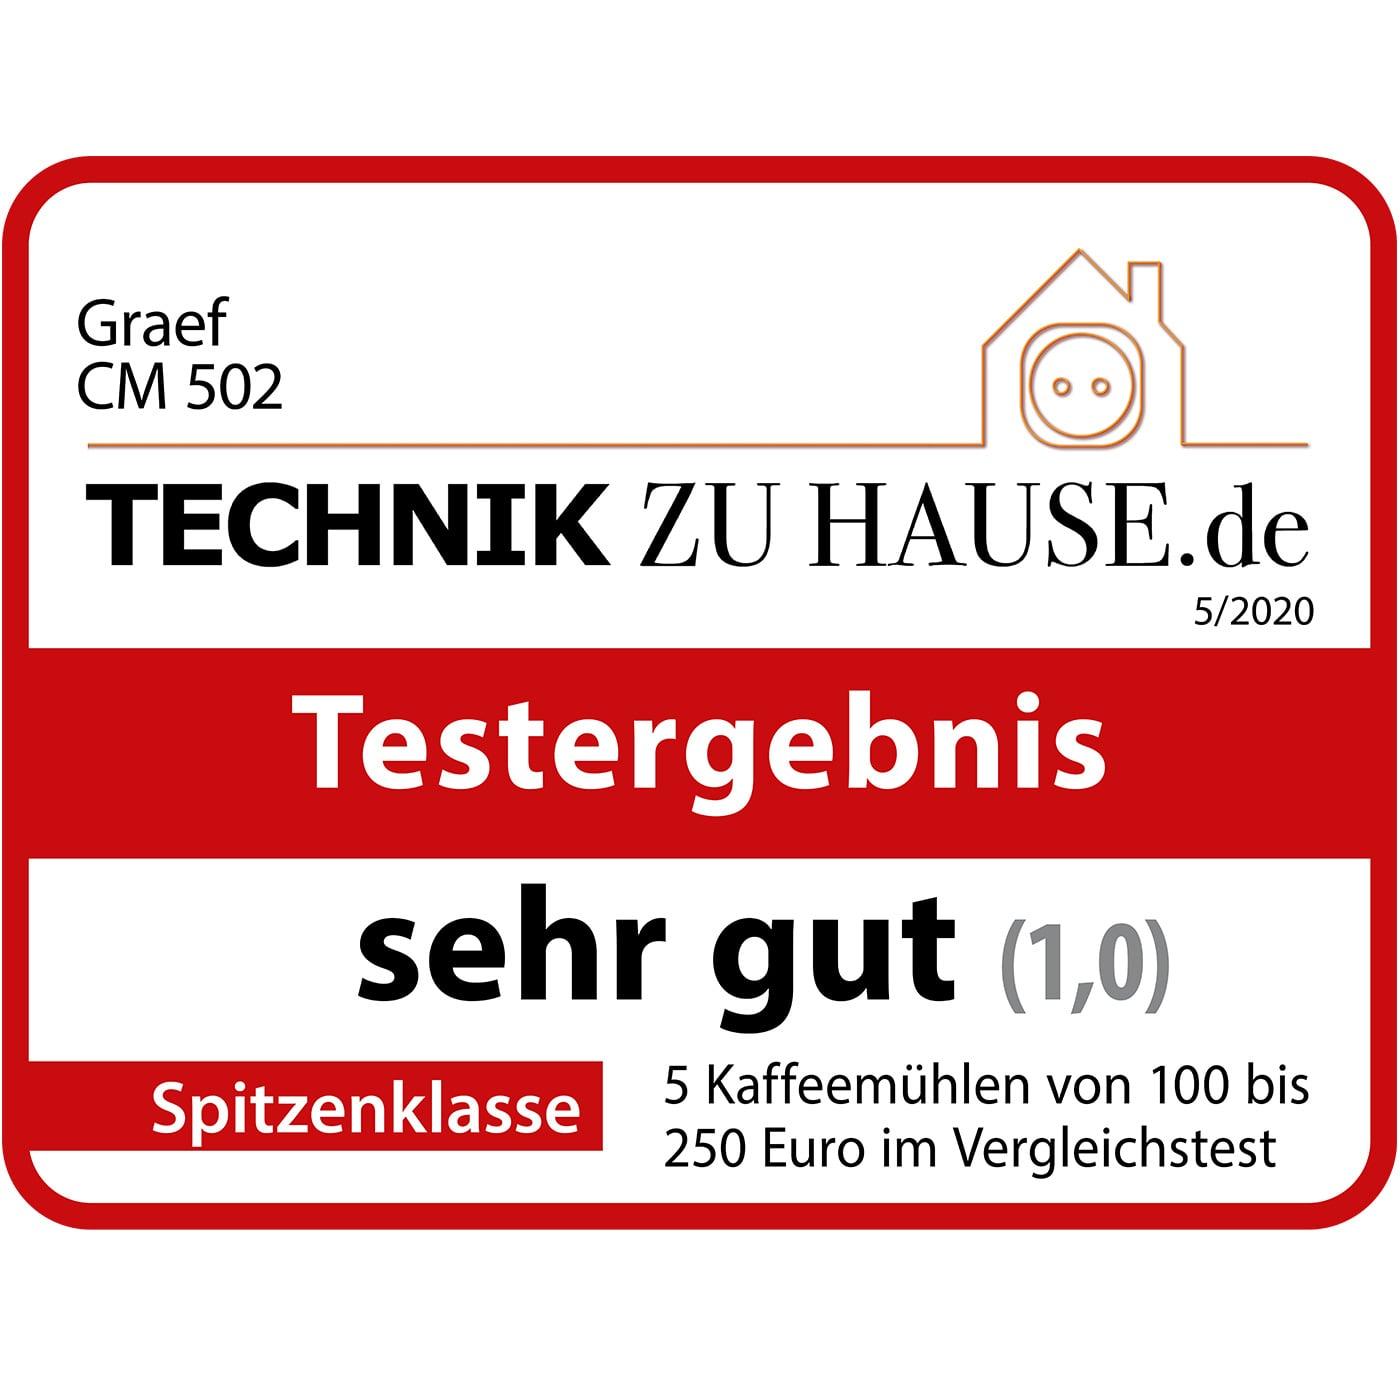 Testlogo CM502 TechnikzuHause.de